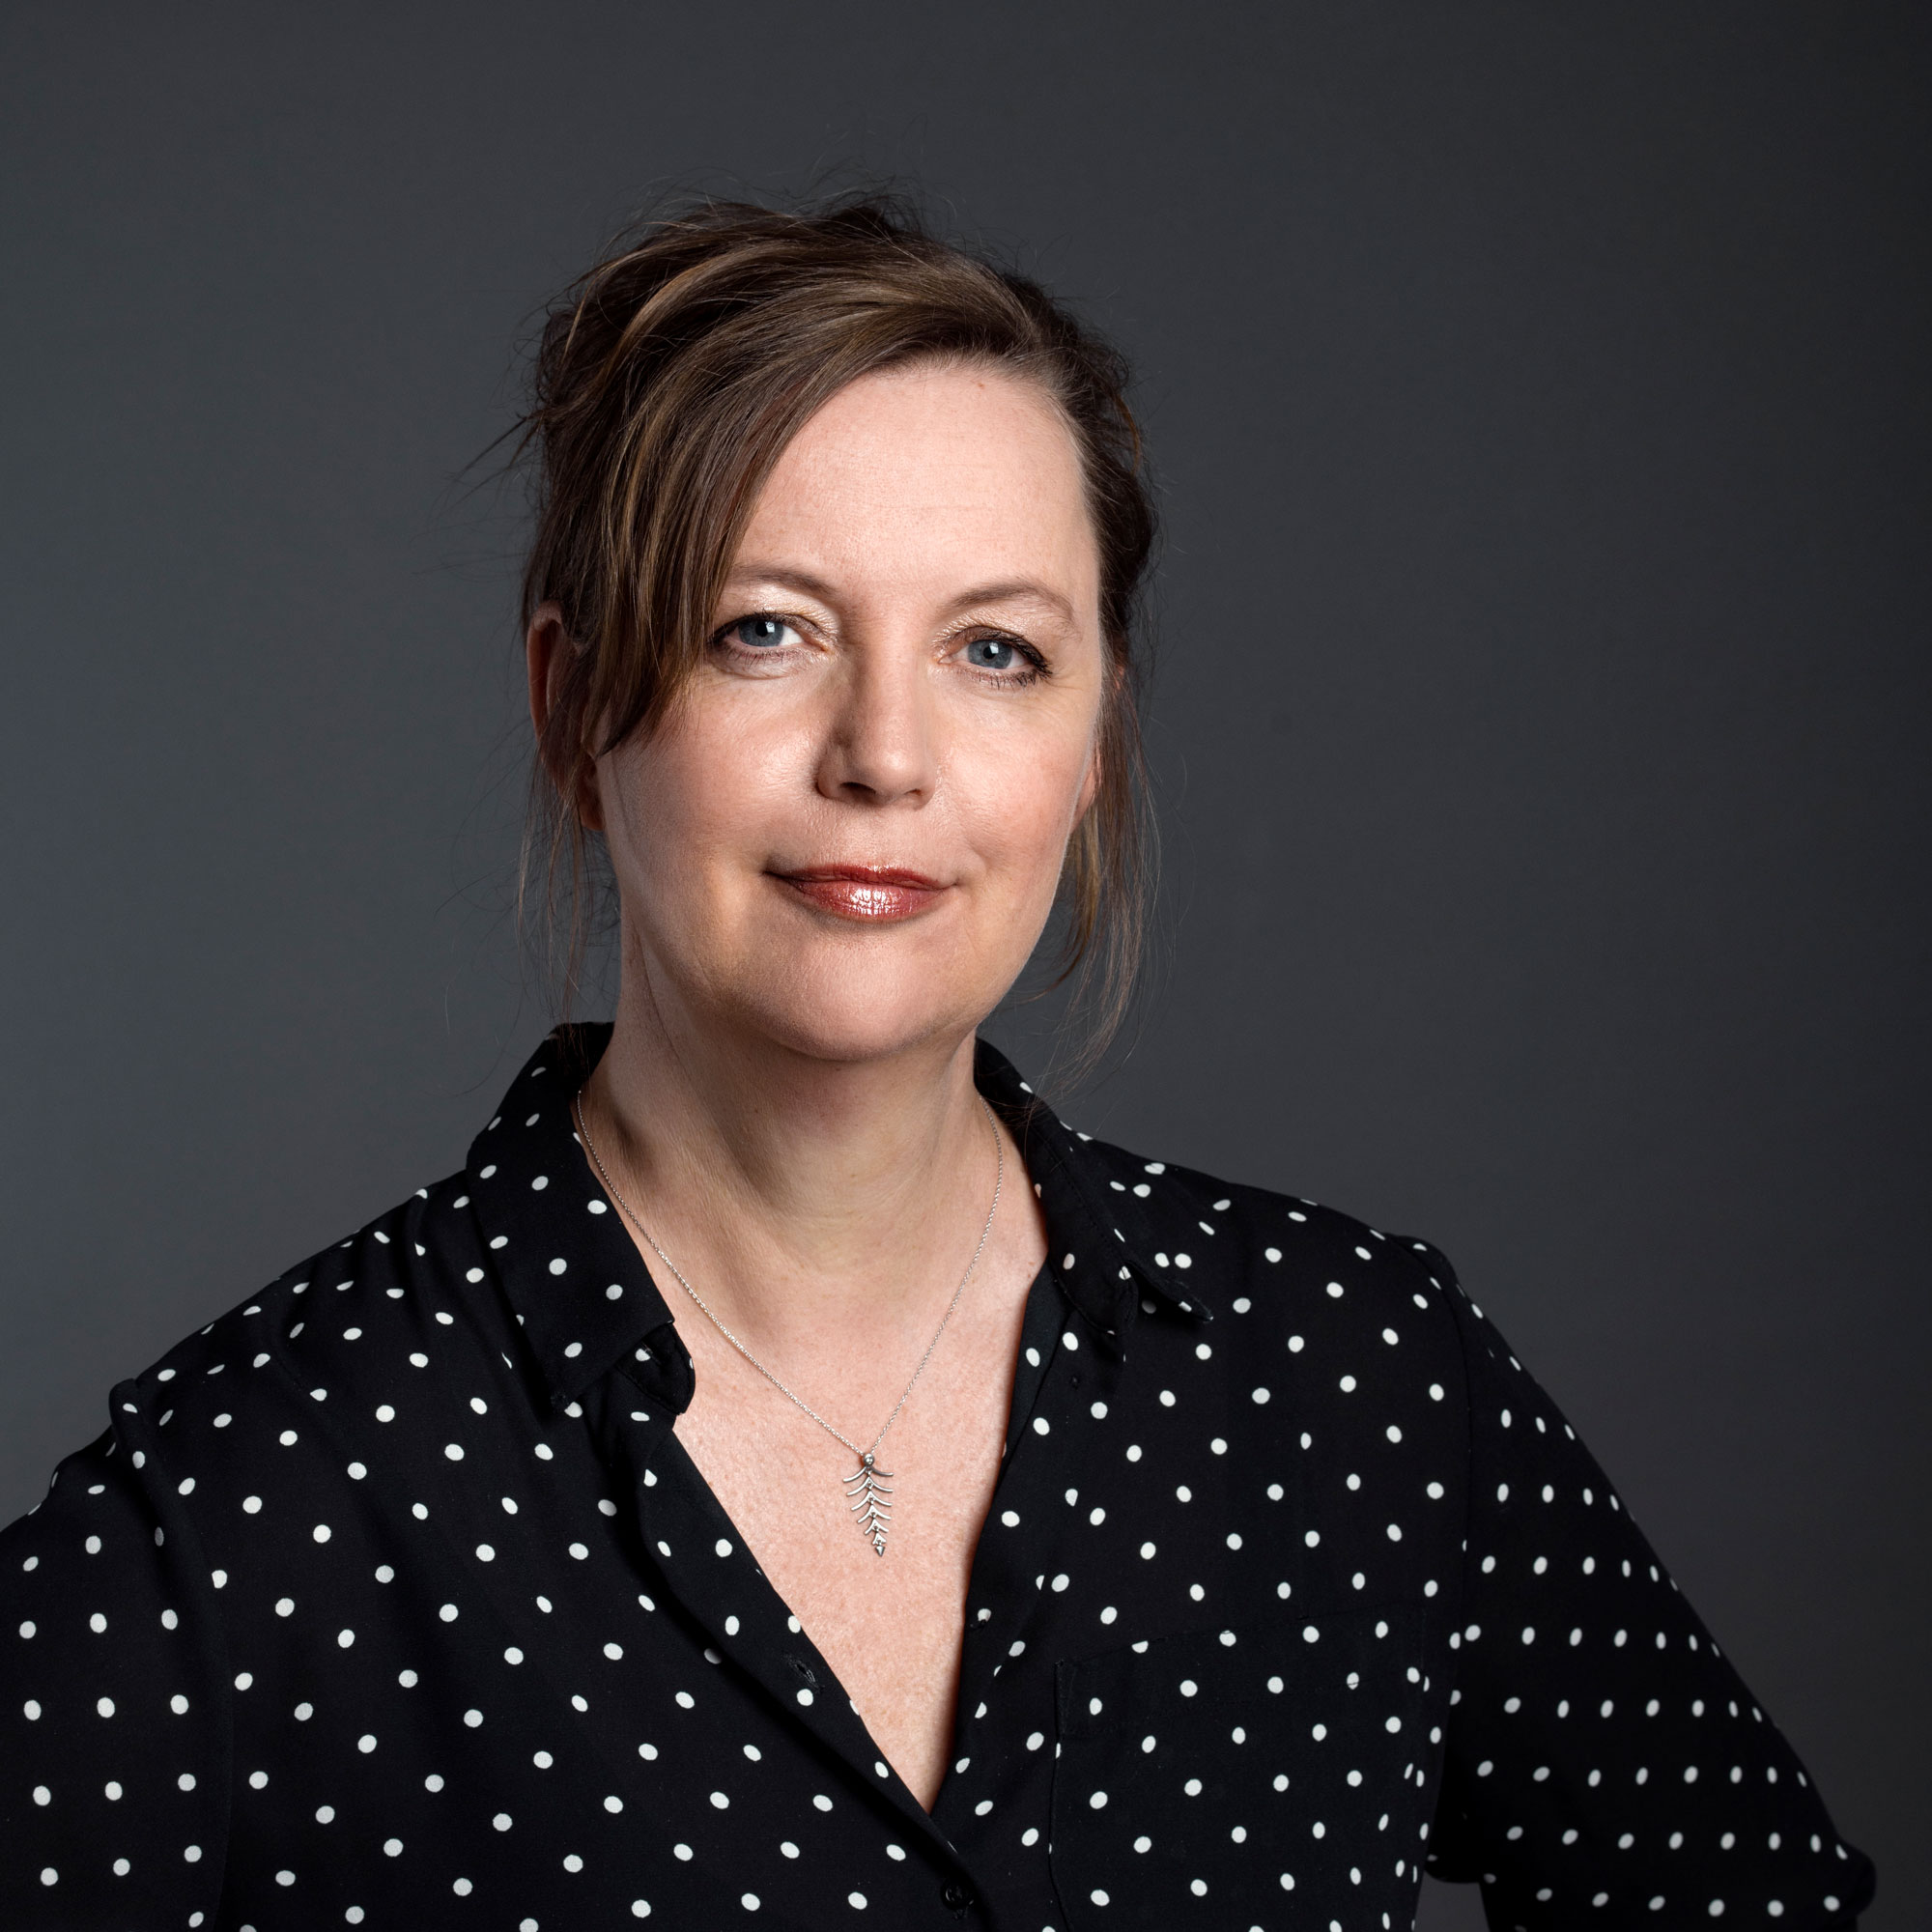 Katrine Marie Guldager